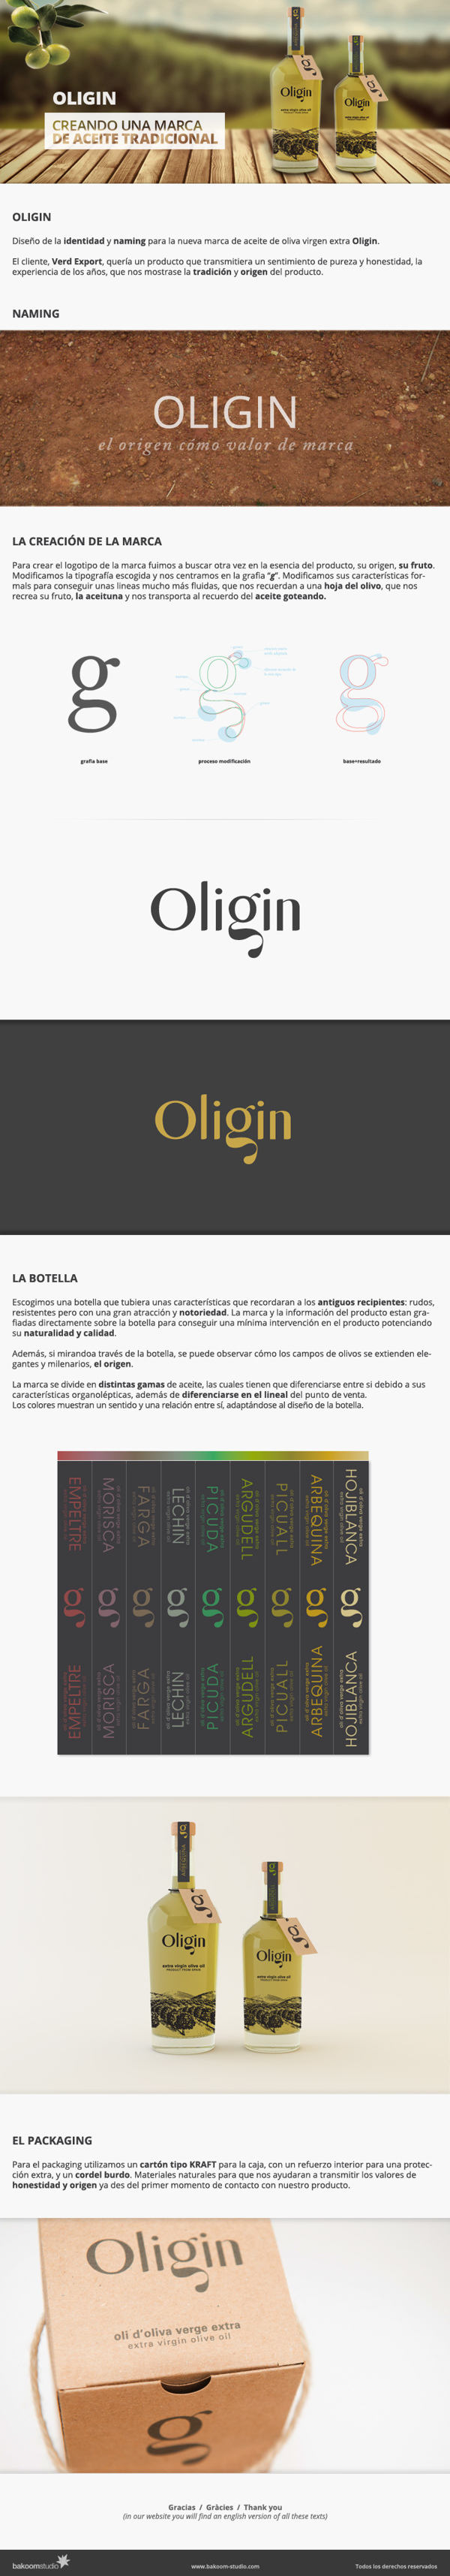 Oligin by Bakoom Studio , via Behance